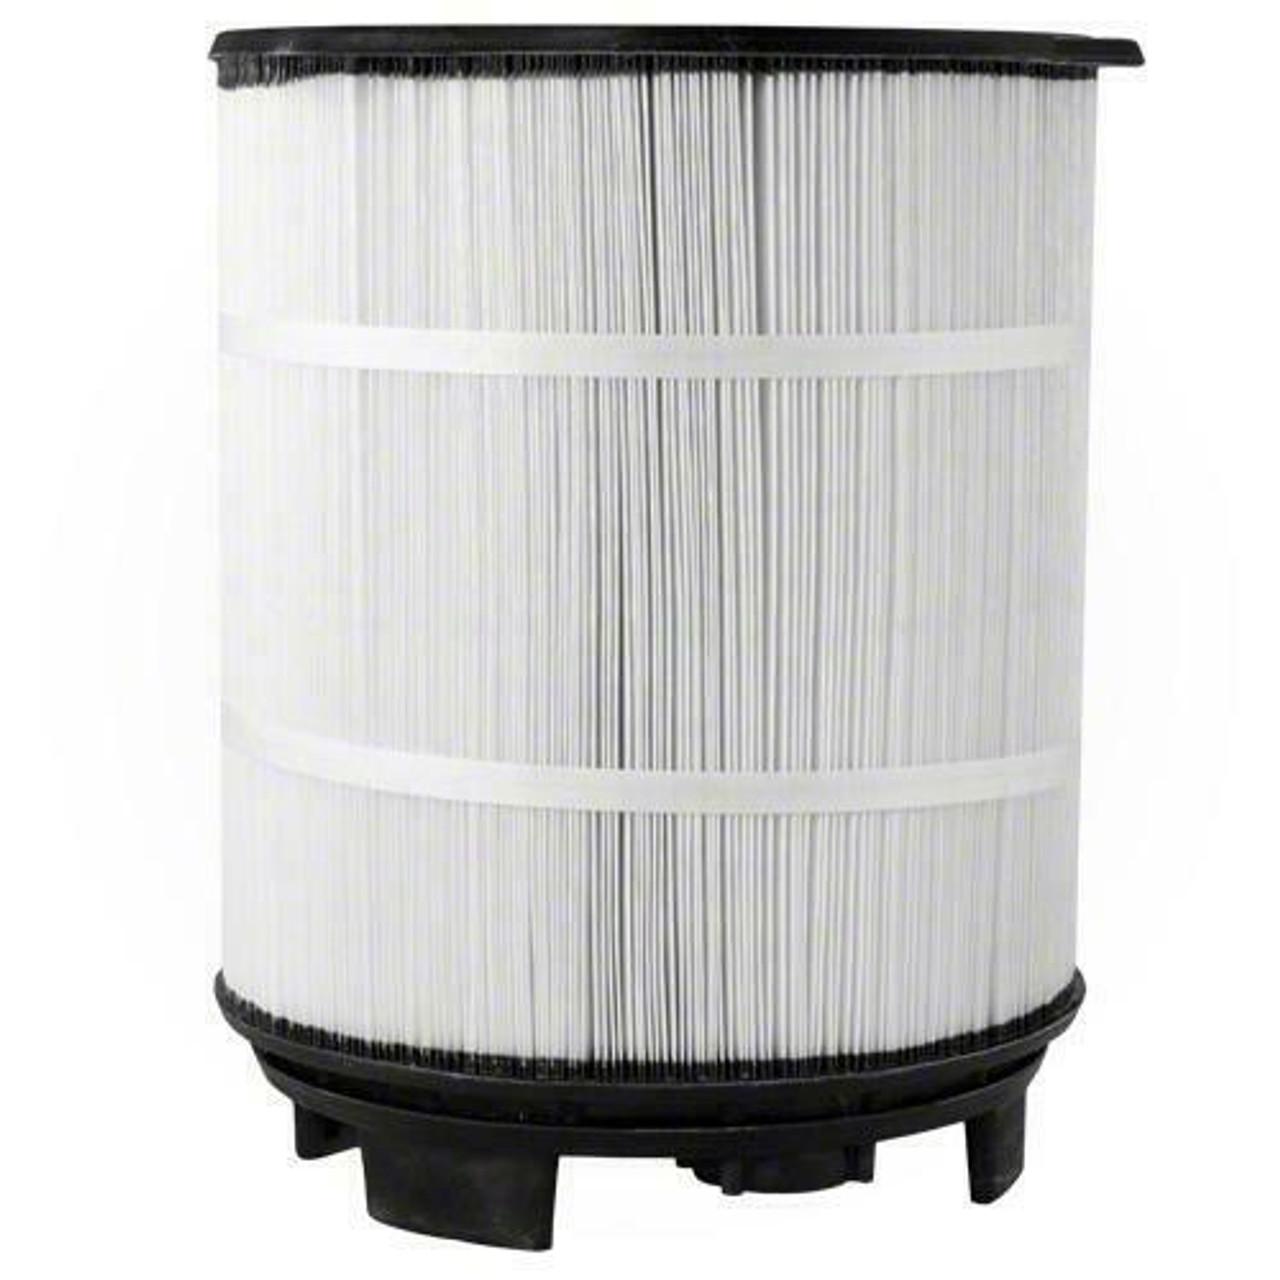 Replacement Filter Module For PLM Series 150 sq-ft Modular Media Filter Model PLM150